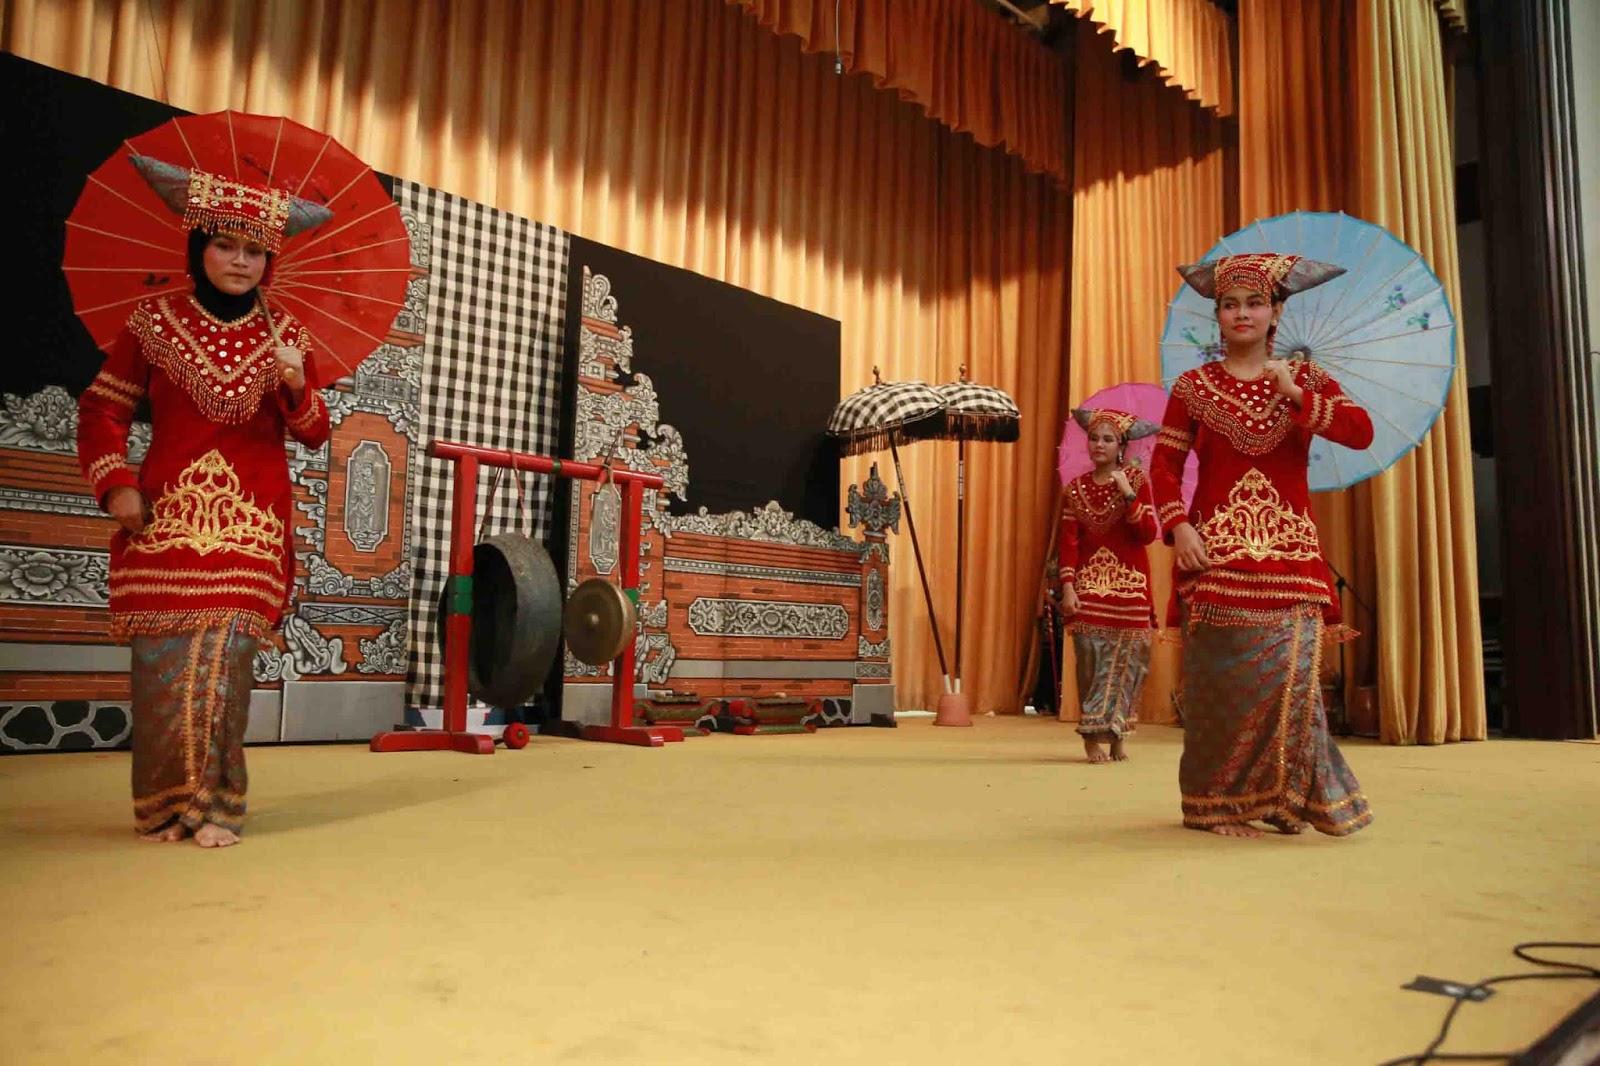 Tari Payung, Tarian Tradisional Dari Sumatra Barat